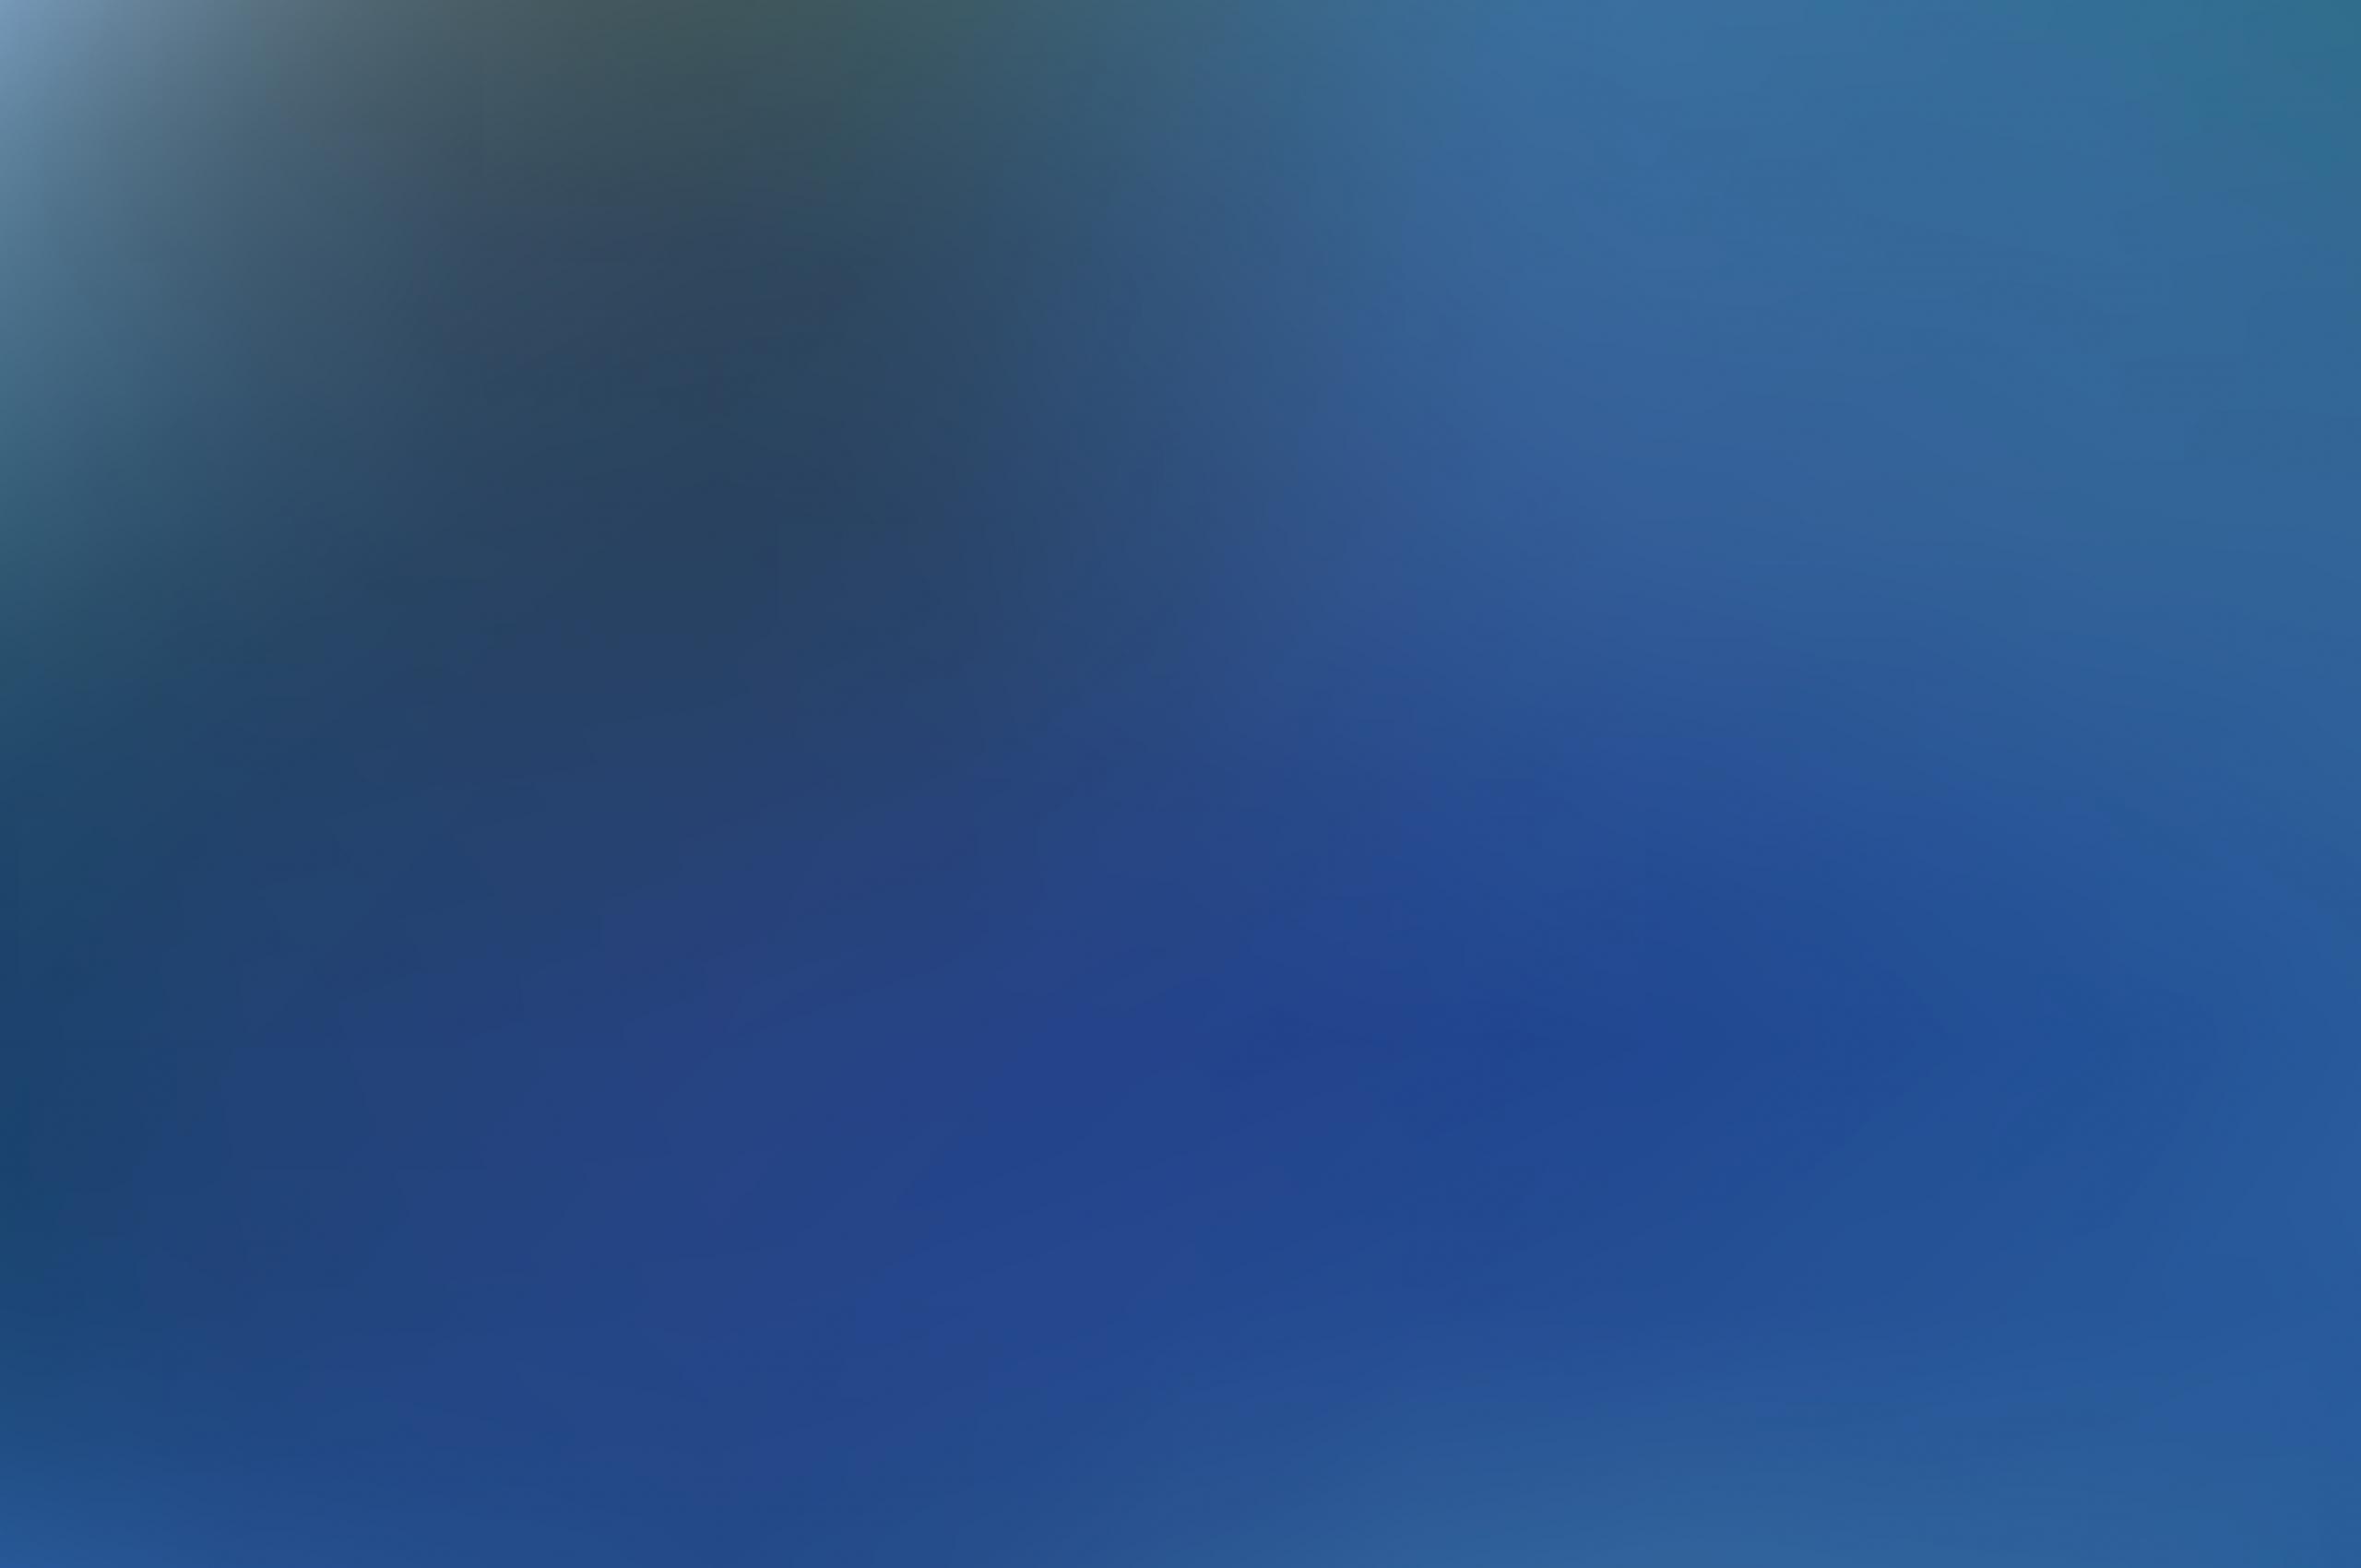 Free Download Dark Blue Professional Background Image